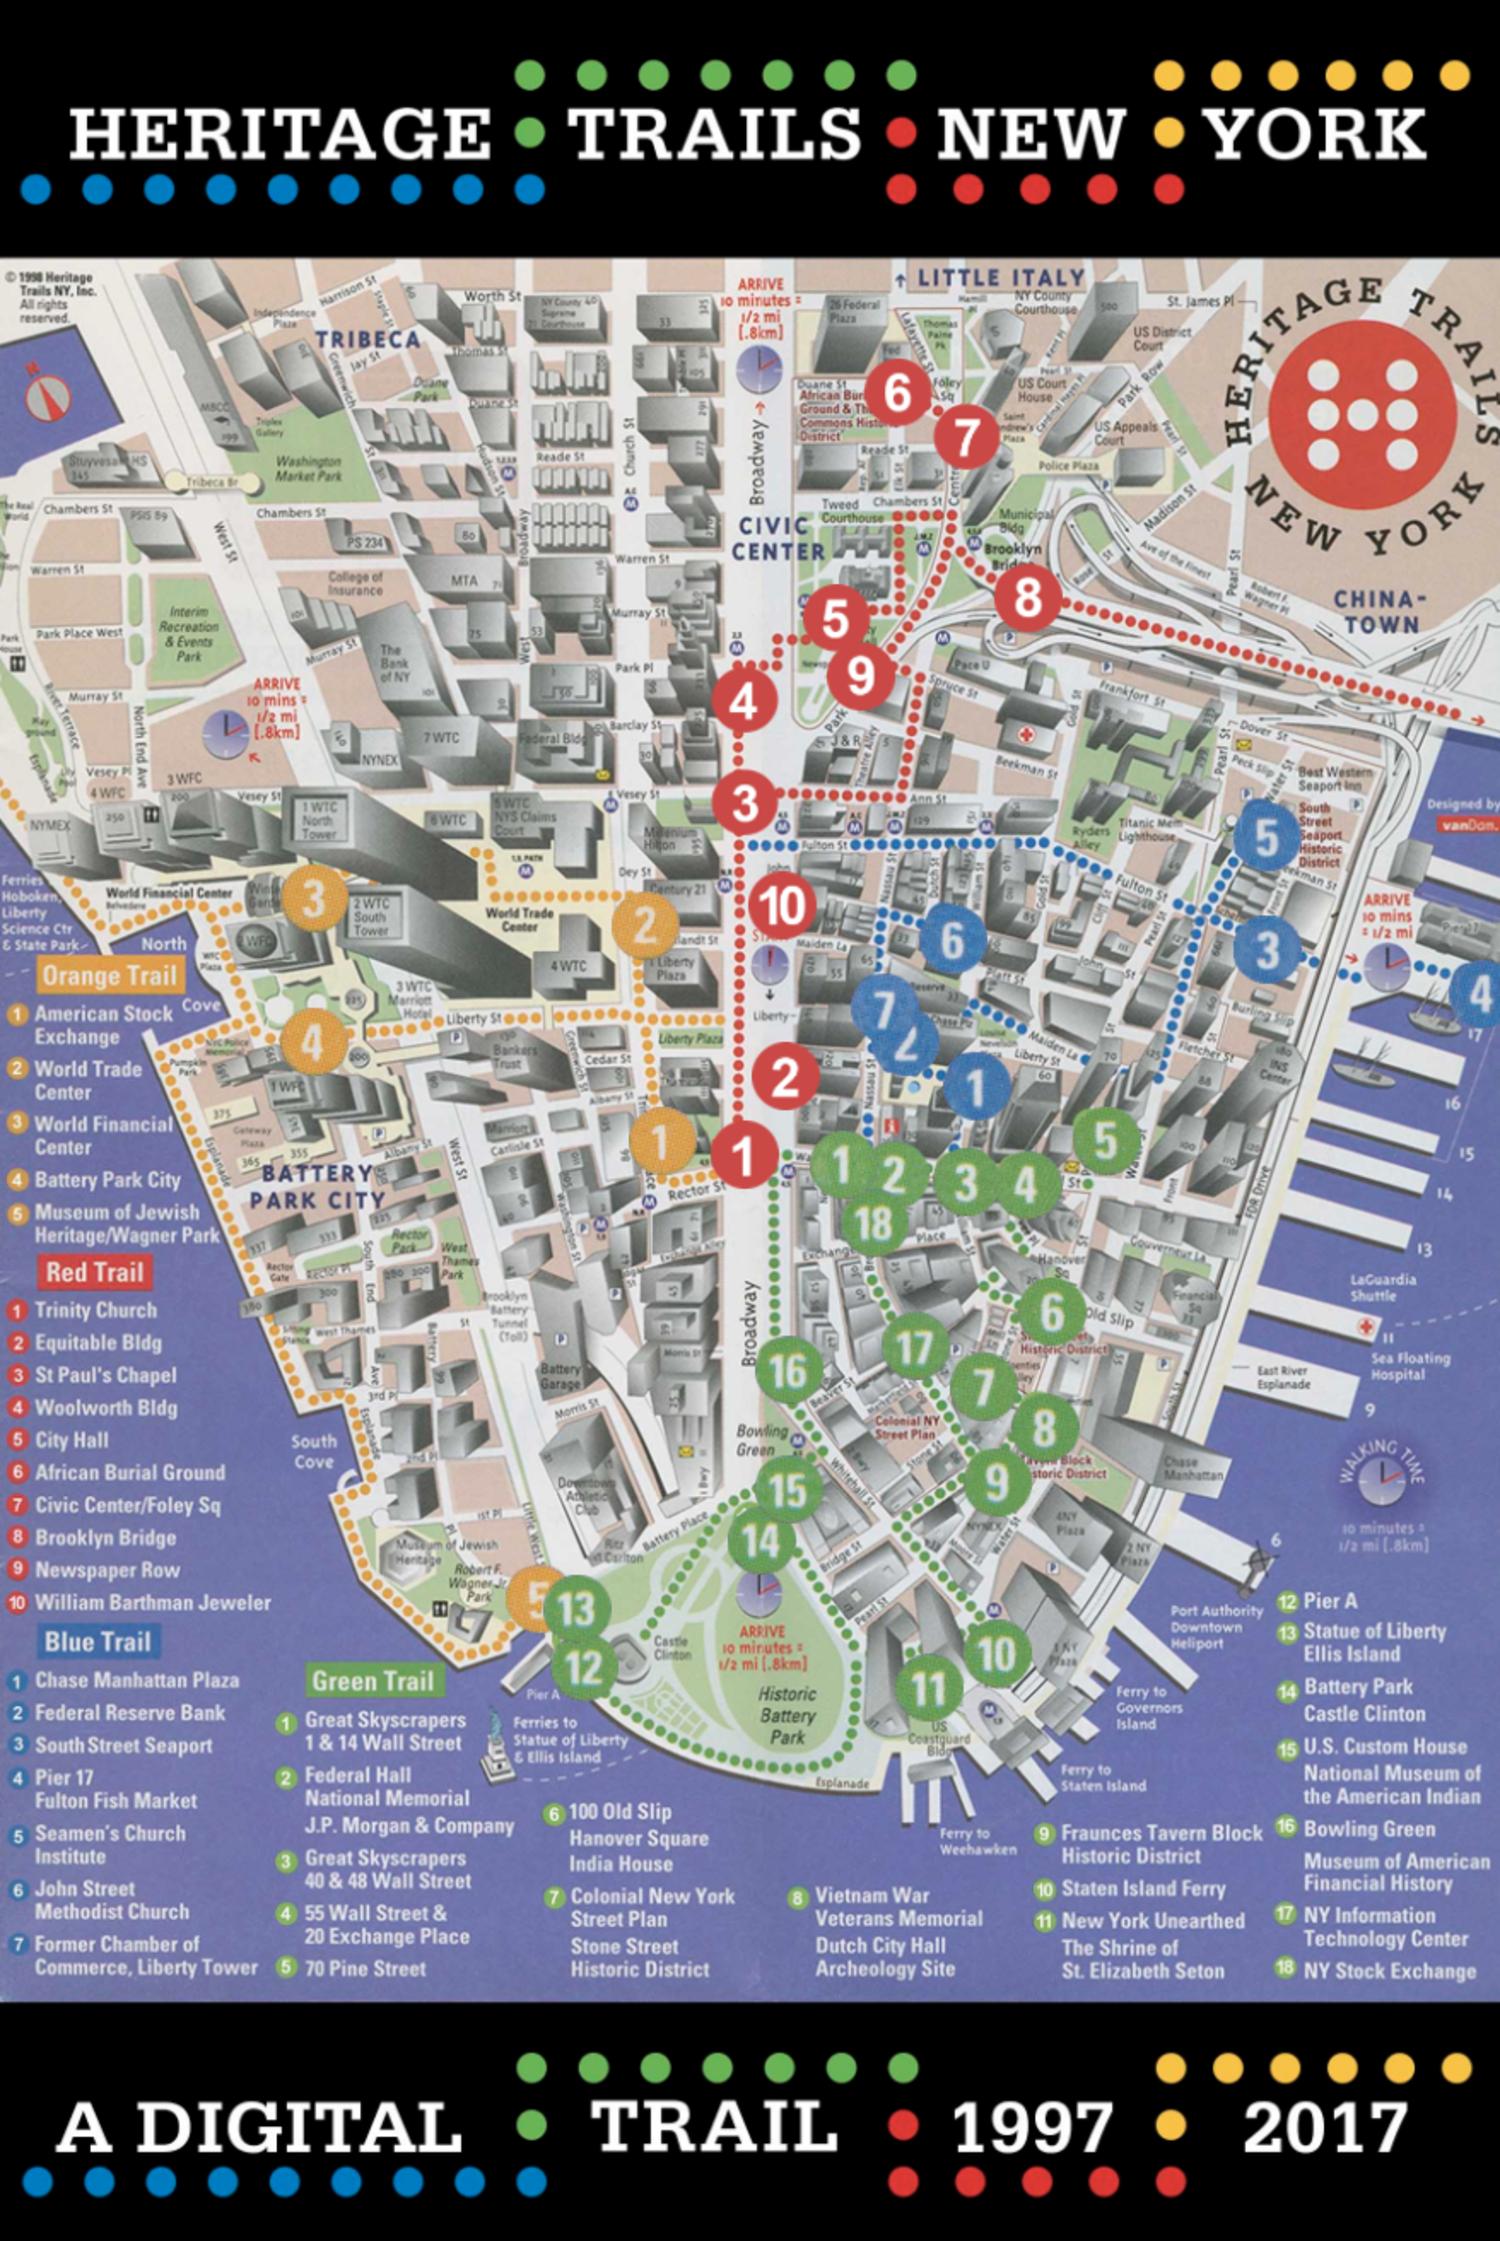 Heritage Trails New York (screenshot)